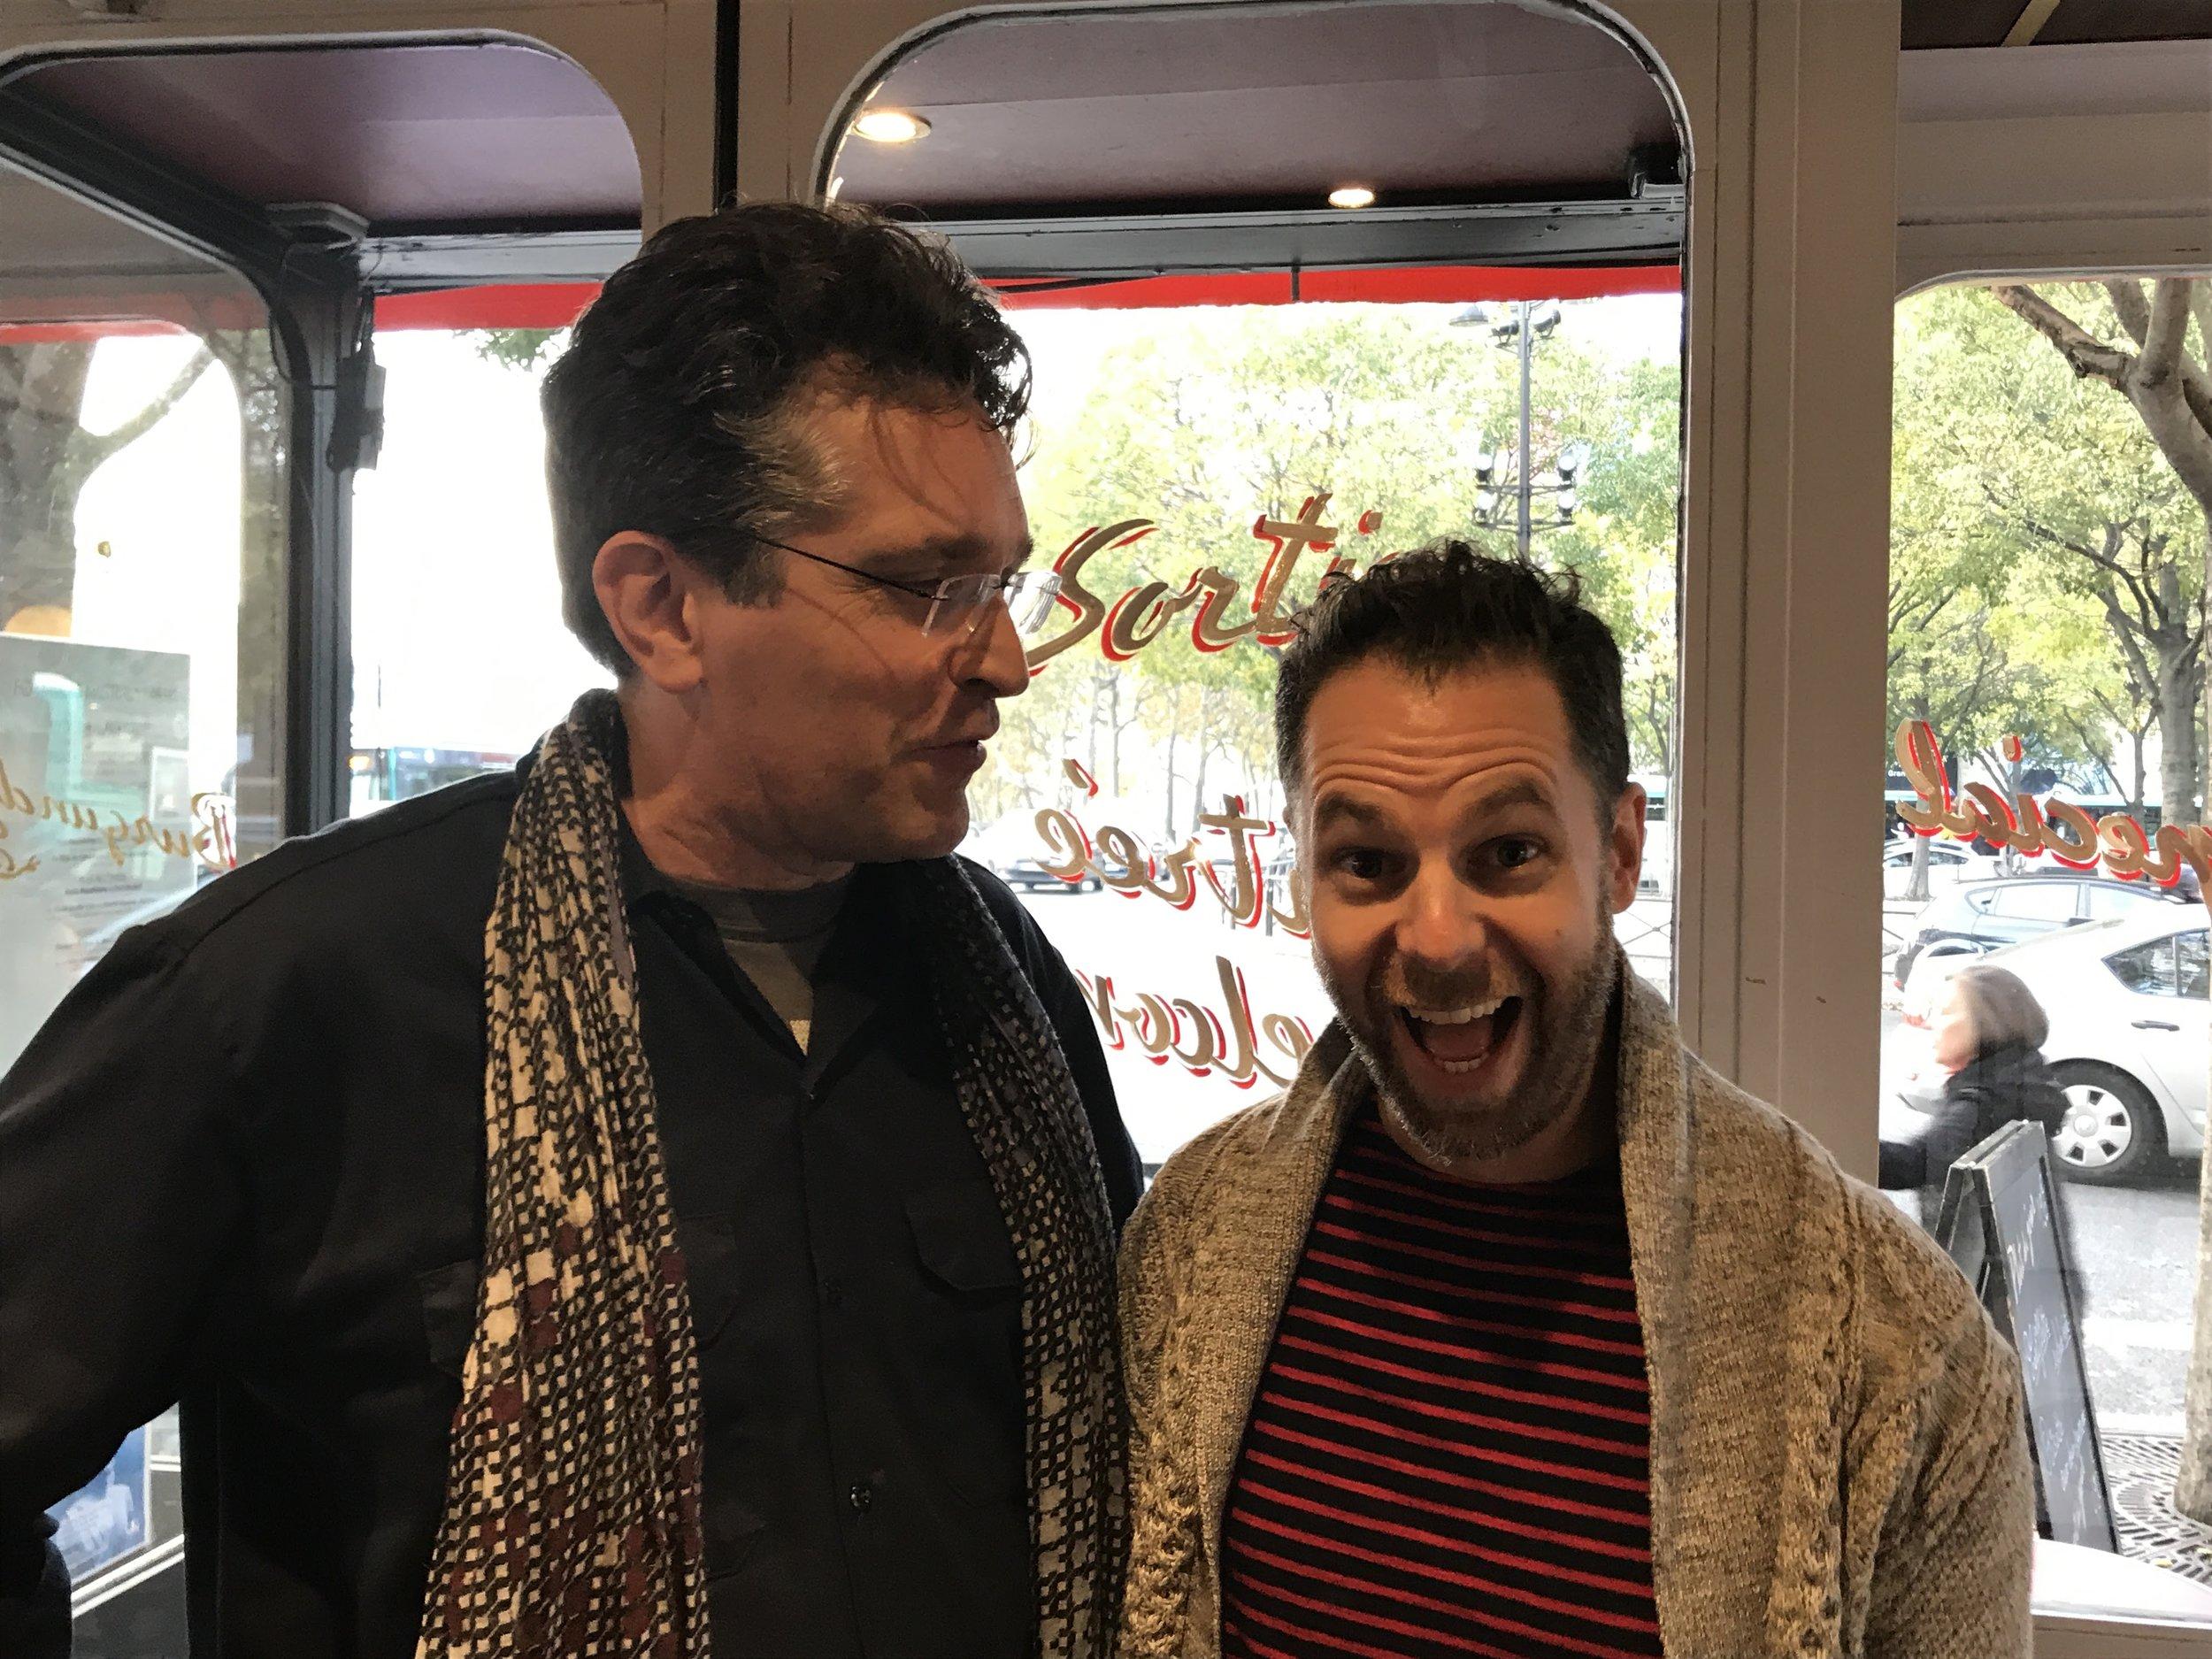 with Andrew Crocker at Le Mistral, Paris, November 2017